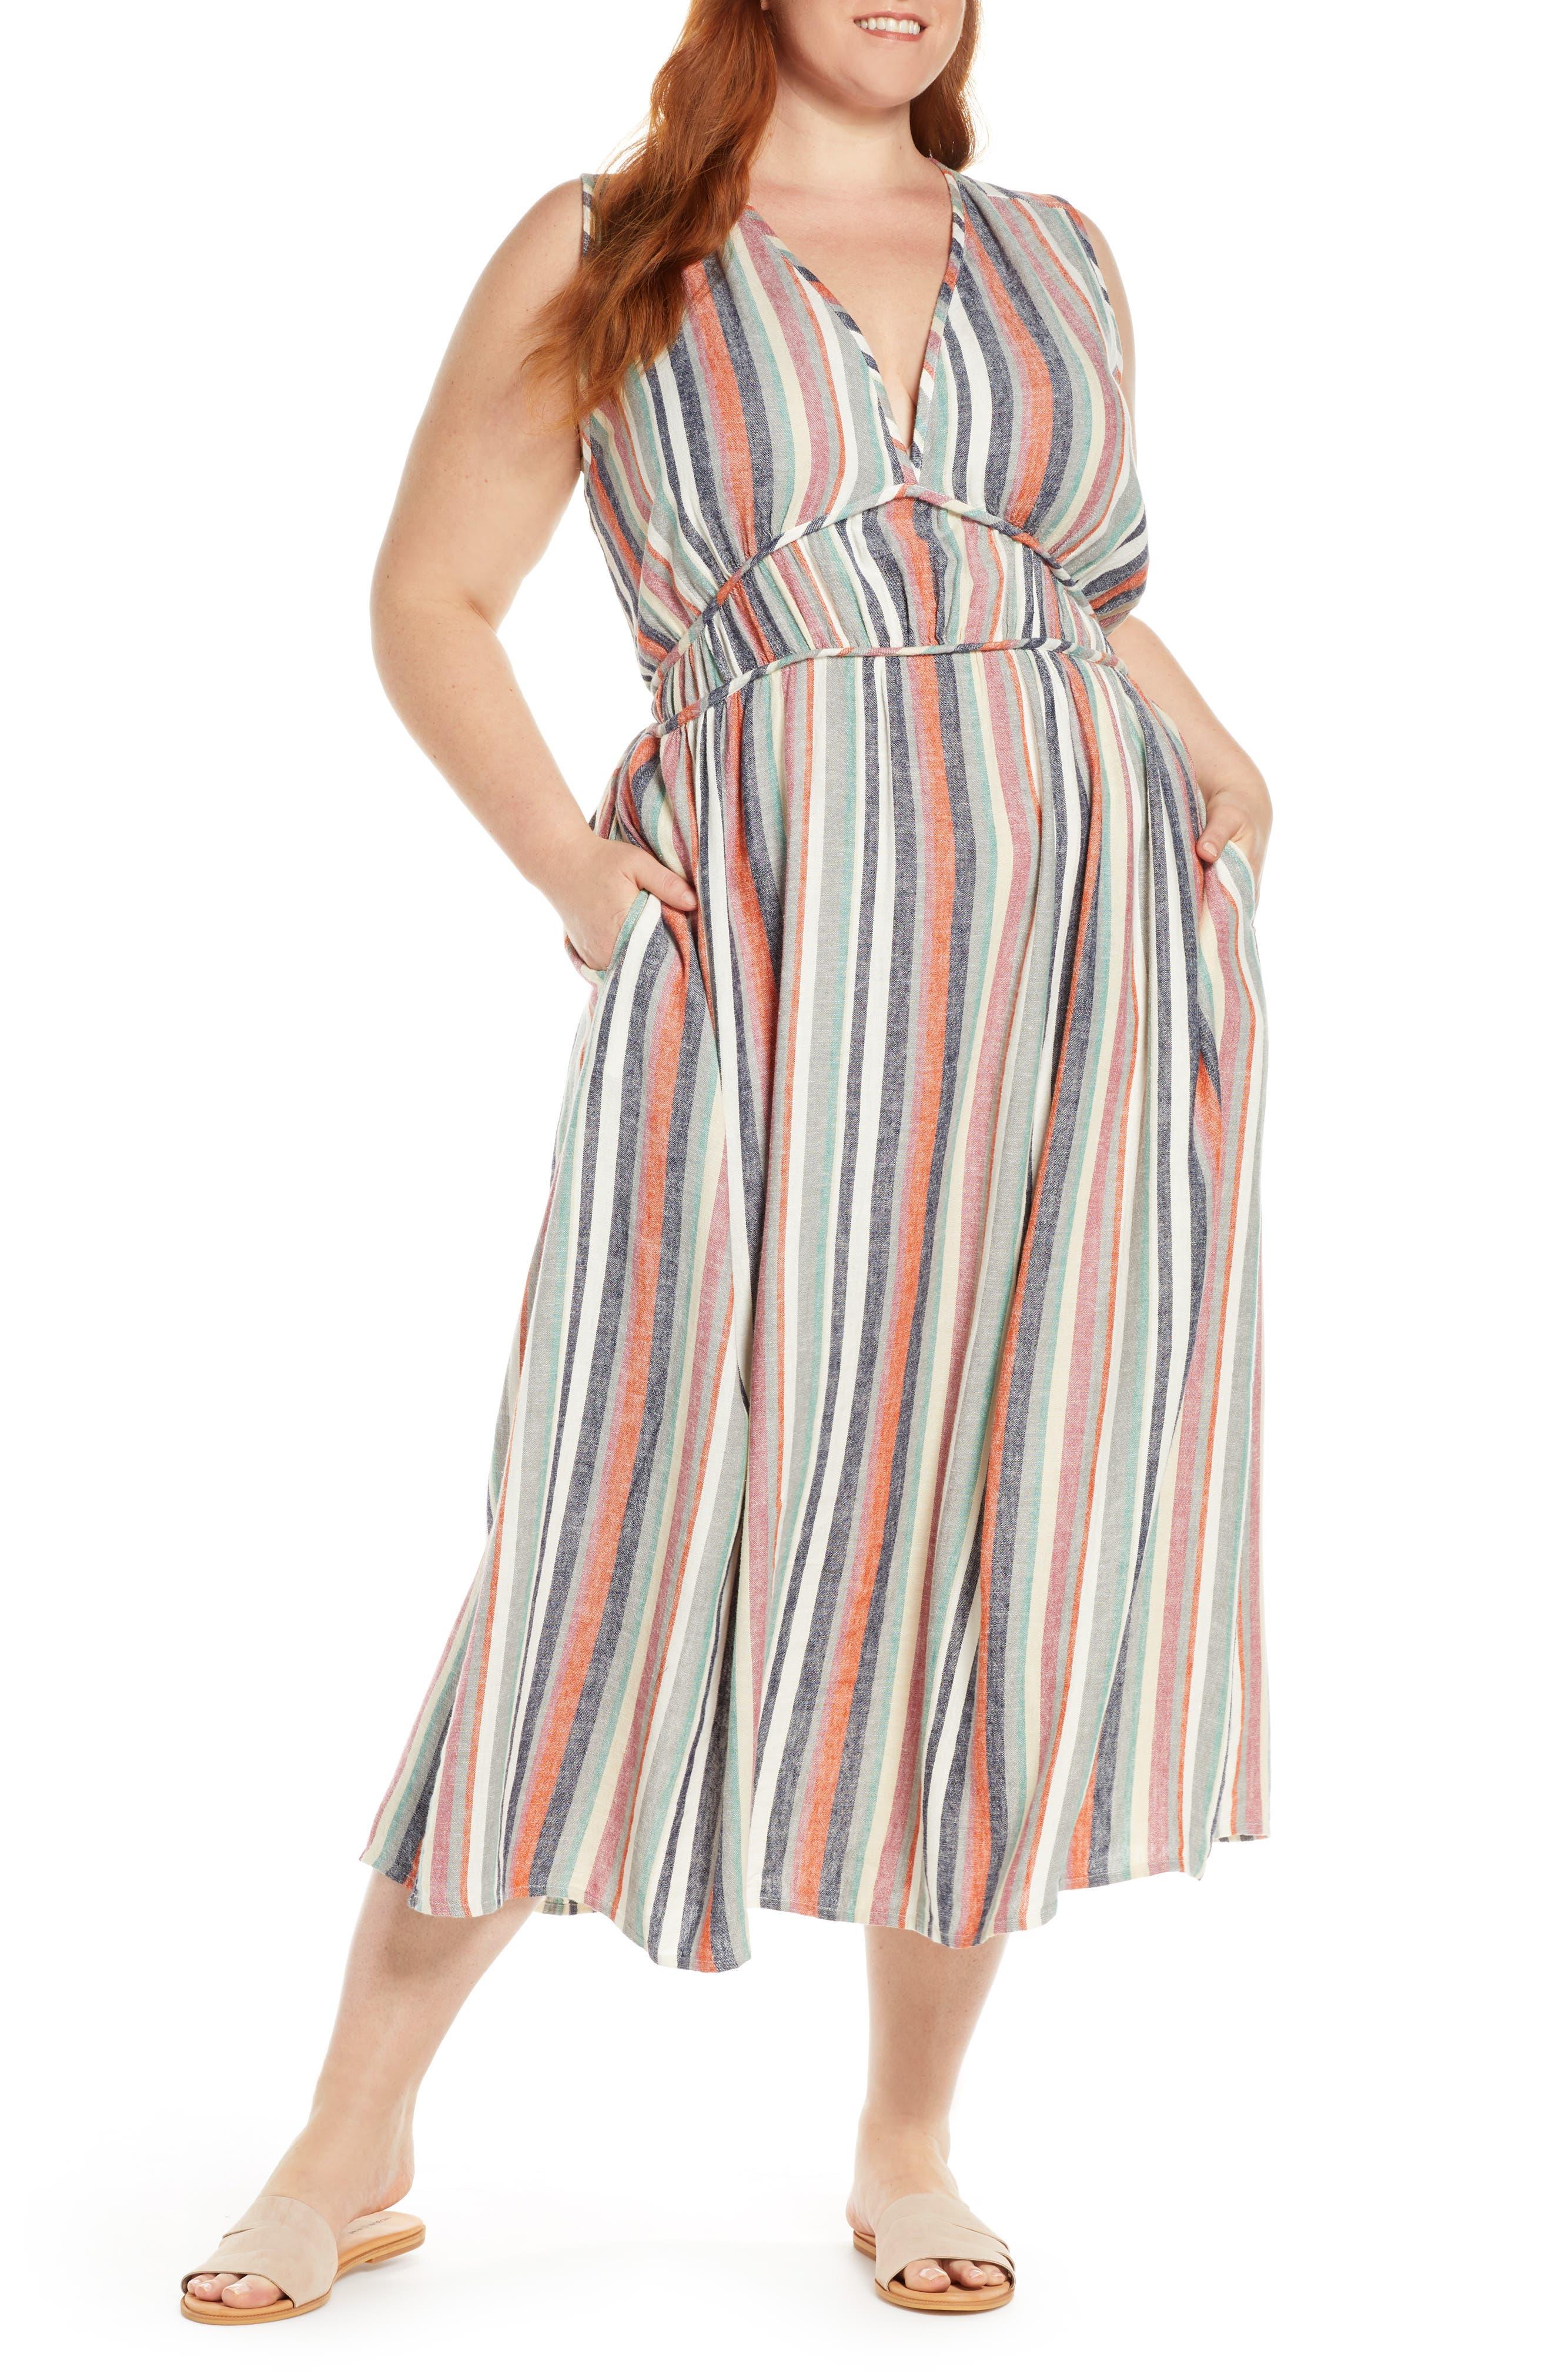 283ad7defb9 Plus-Size Dresses | Nordstrom